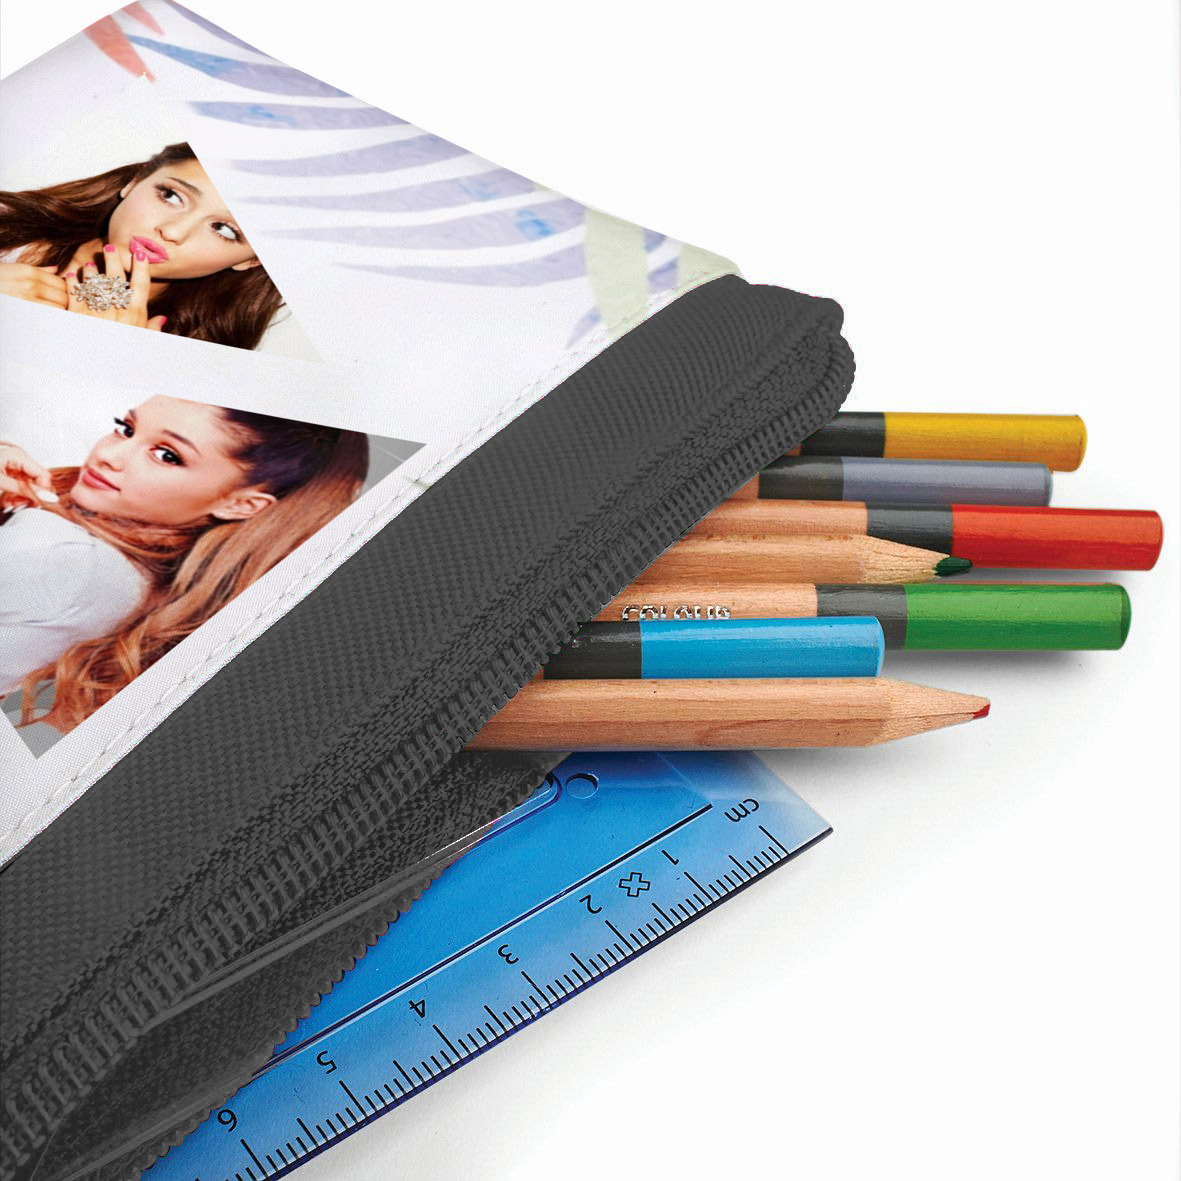 pencil case ariana grande